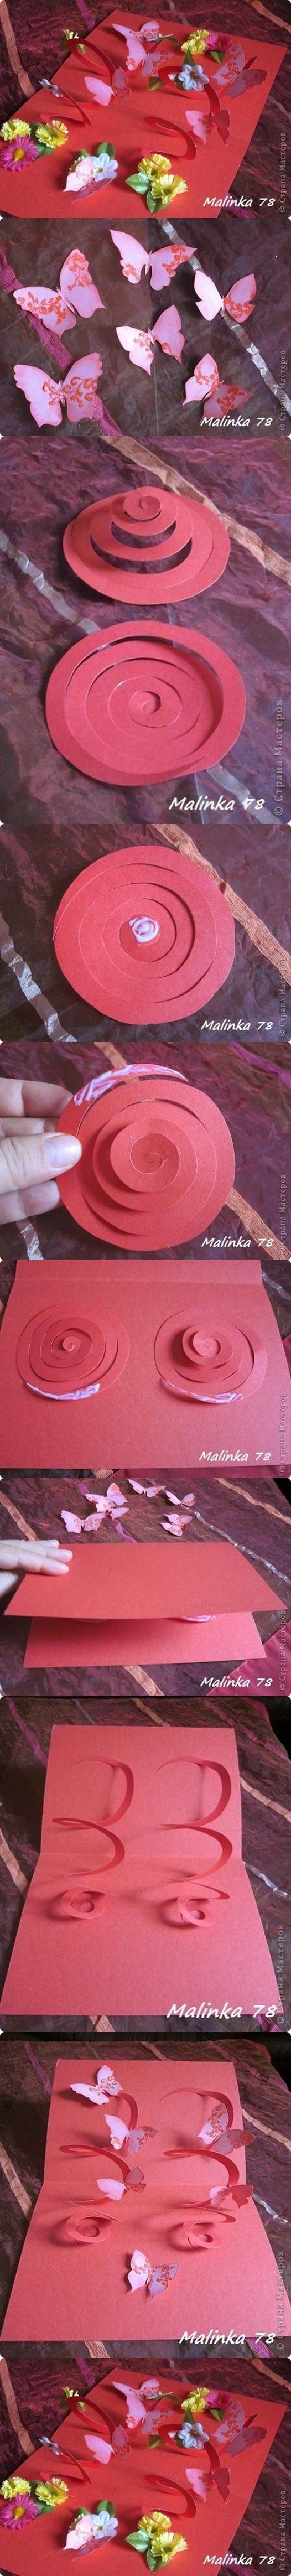 DIY 3D Butterfly and Flower Card | iCreativeIdeas.com Like Us on Facebook ==> https://www.facebook.com/icreativeideas